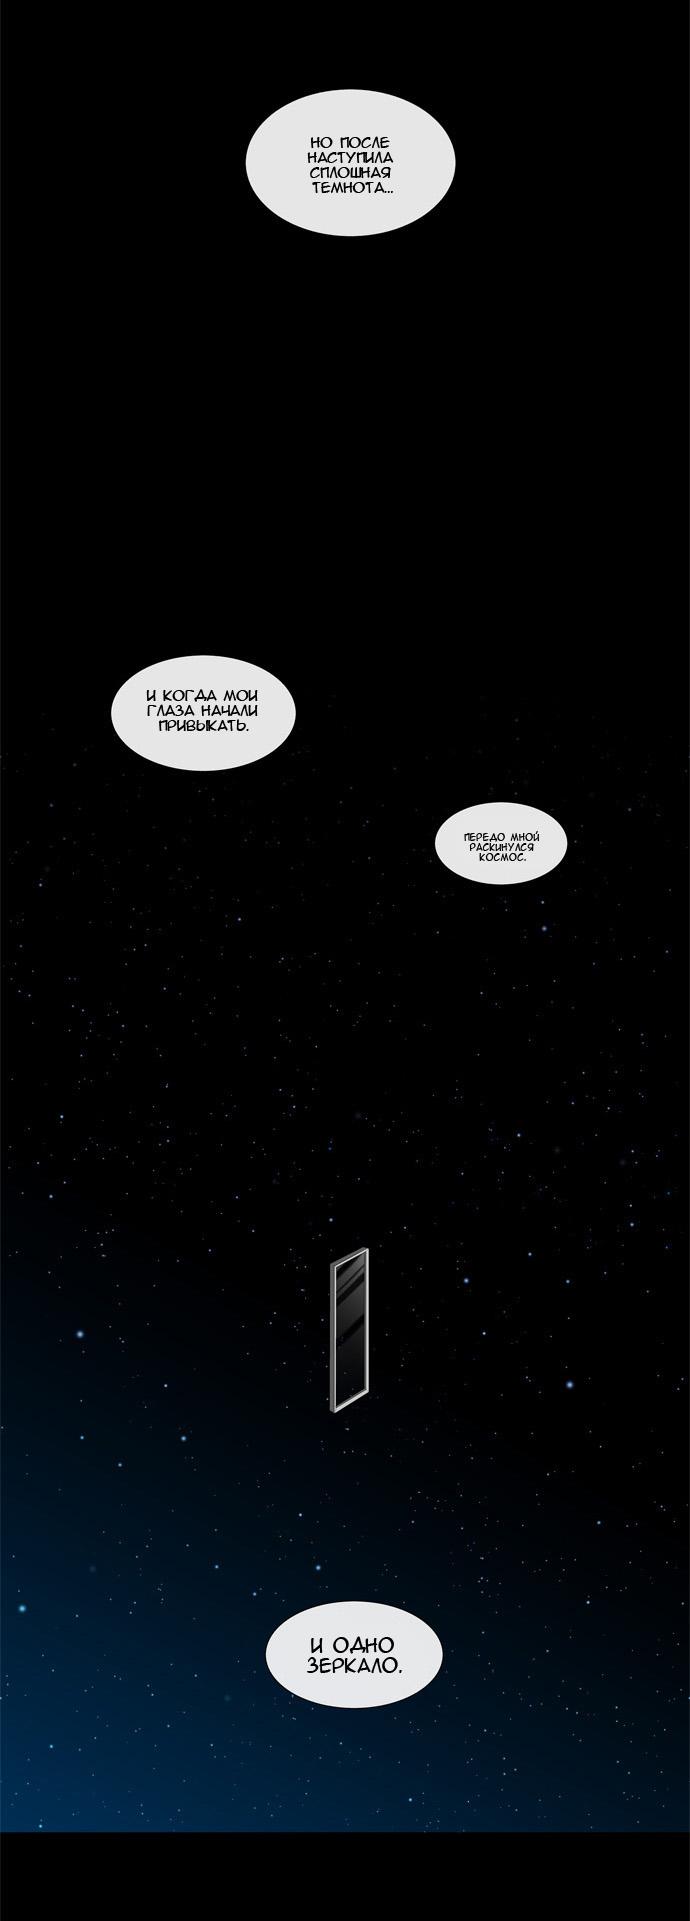 https://r1.ninemanga.com/comics/pic2/32/21344/207411/1427848146611.jpg Page 3